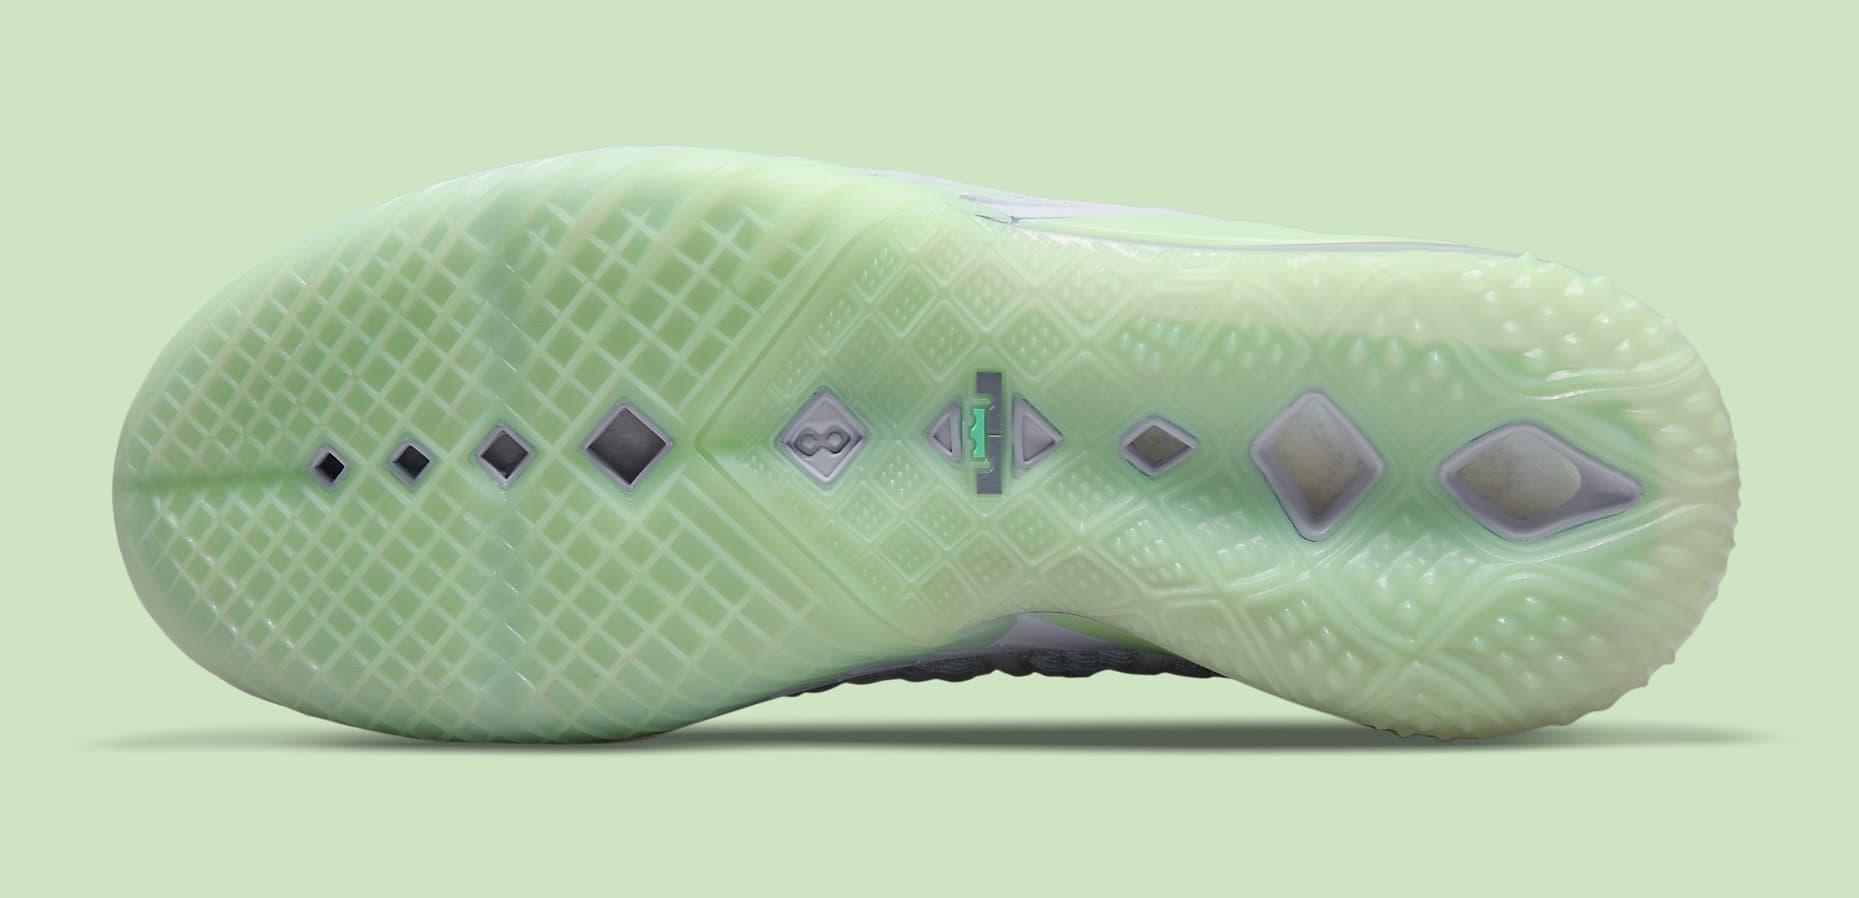 Diana Taurasi x Nike LeBron 18 PE CQ9283-401 Outsole